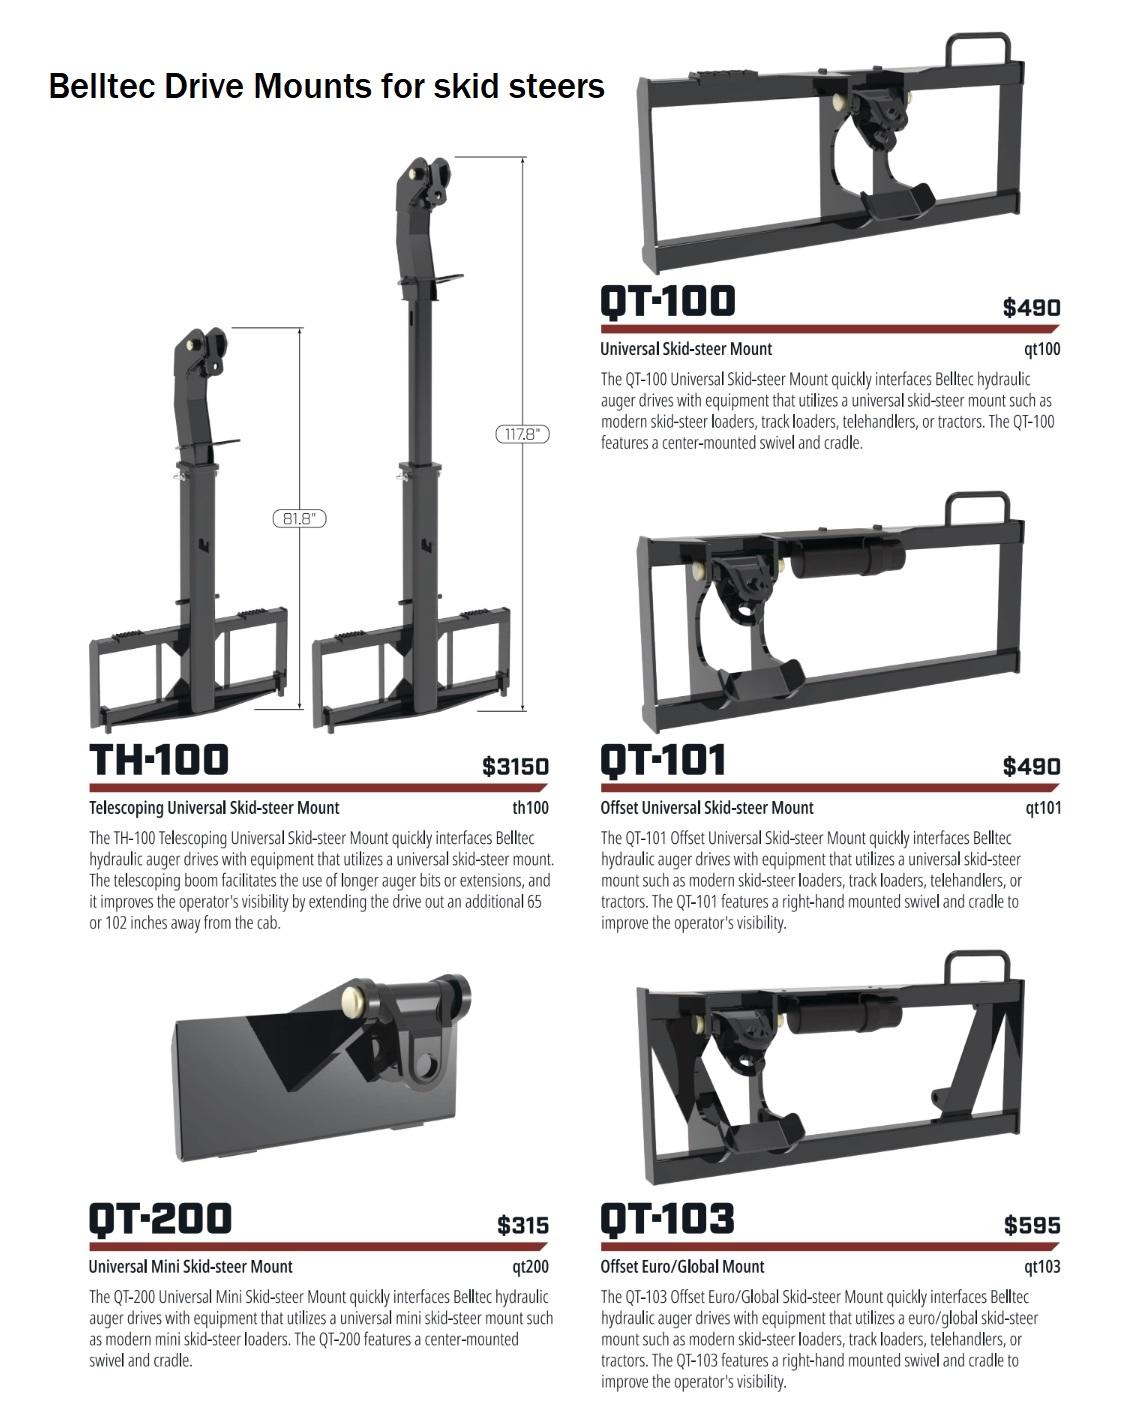 Belltec-skid-steer-auger-drive-mounts-1